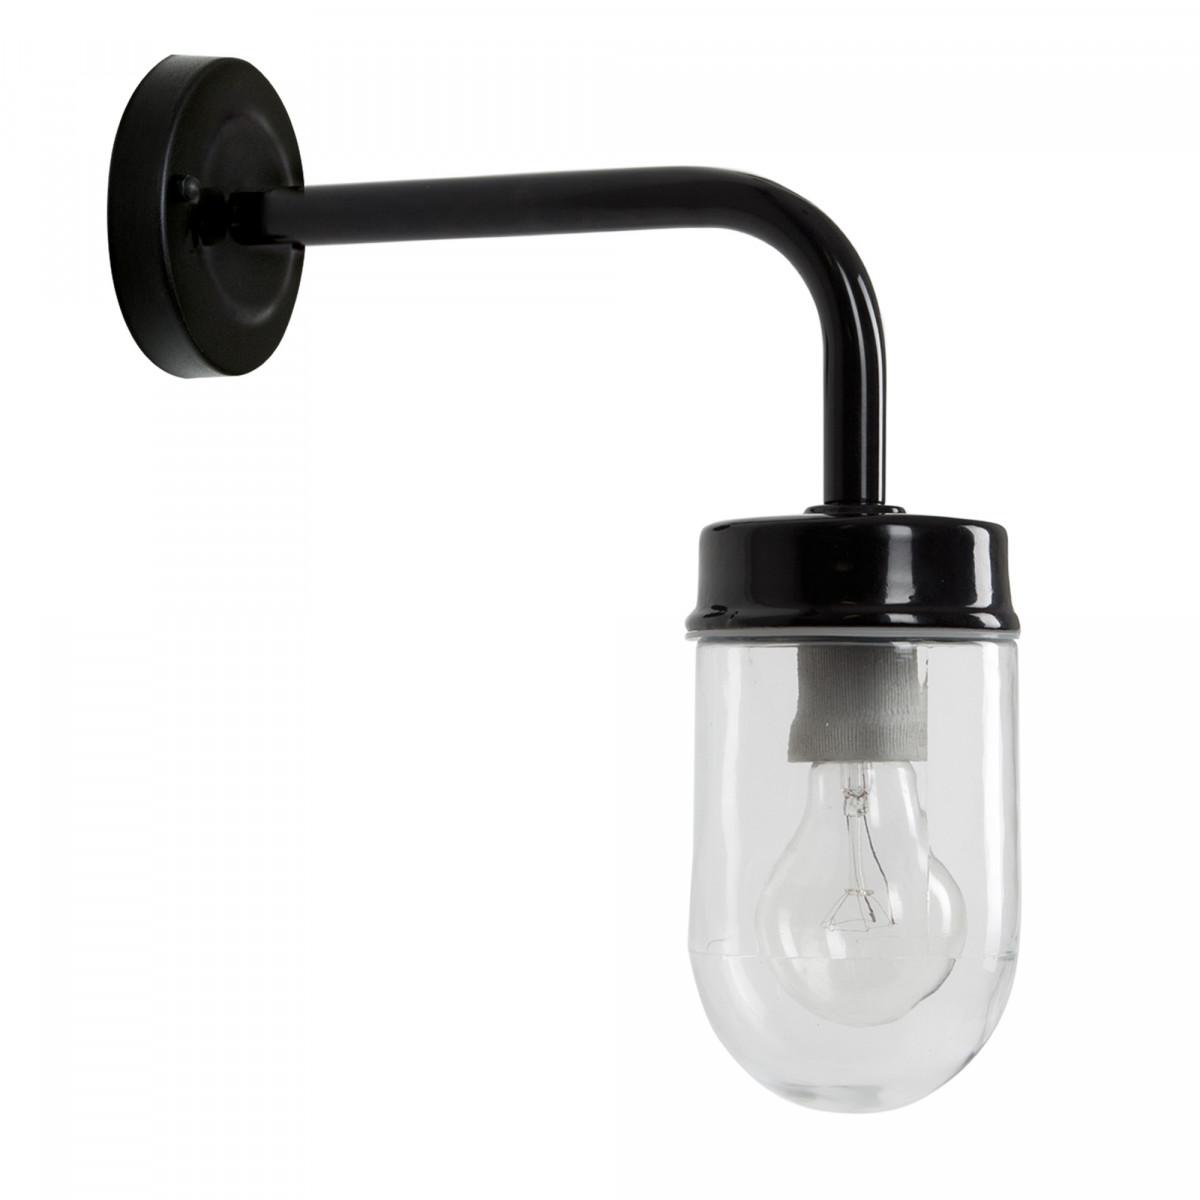 Buitenlamp Genius